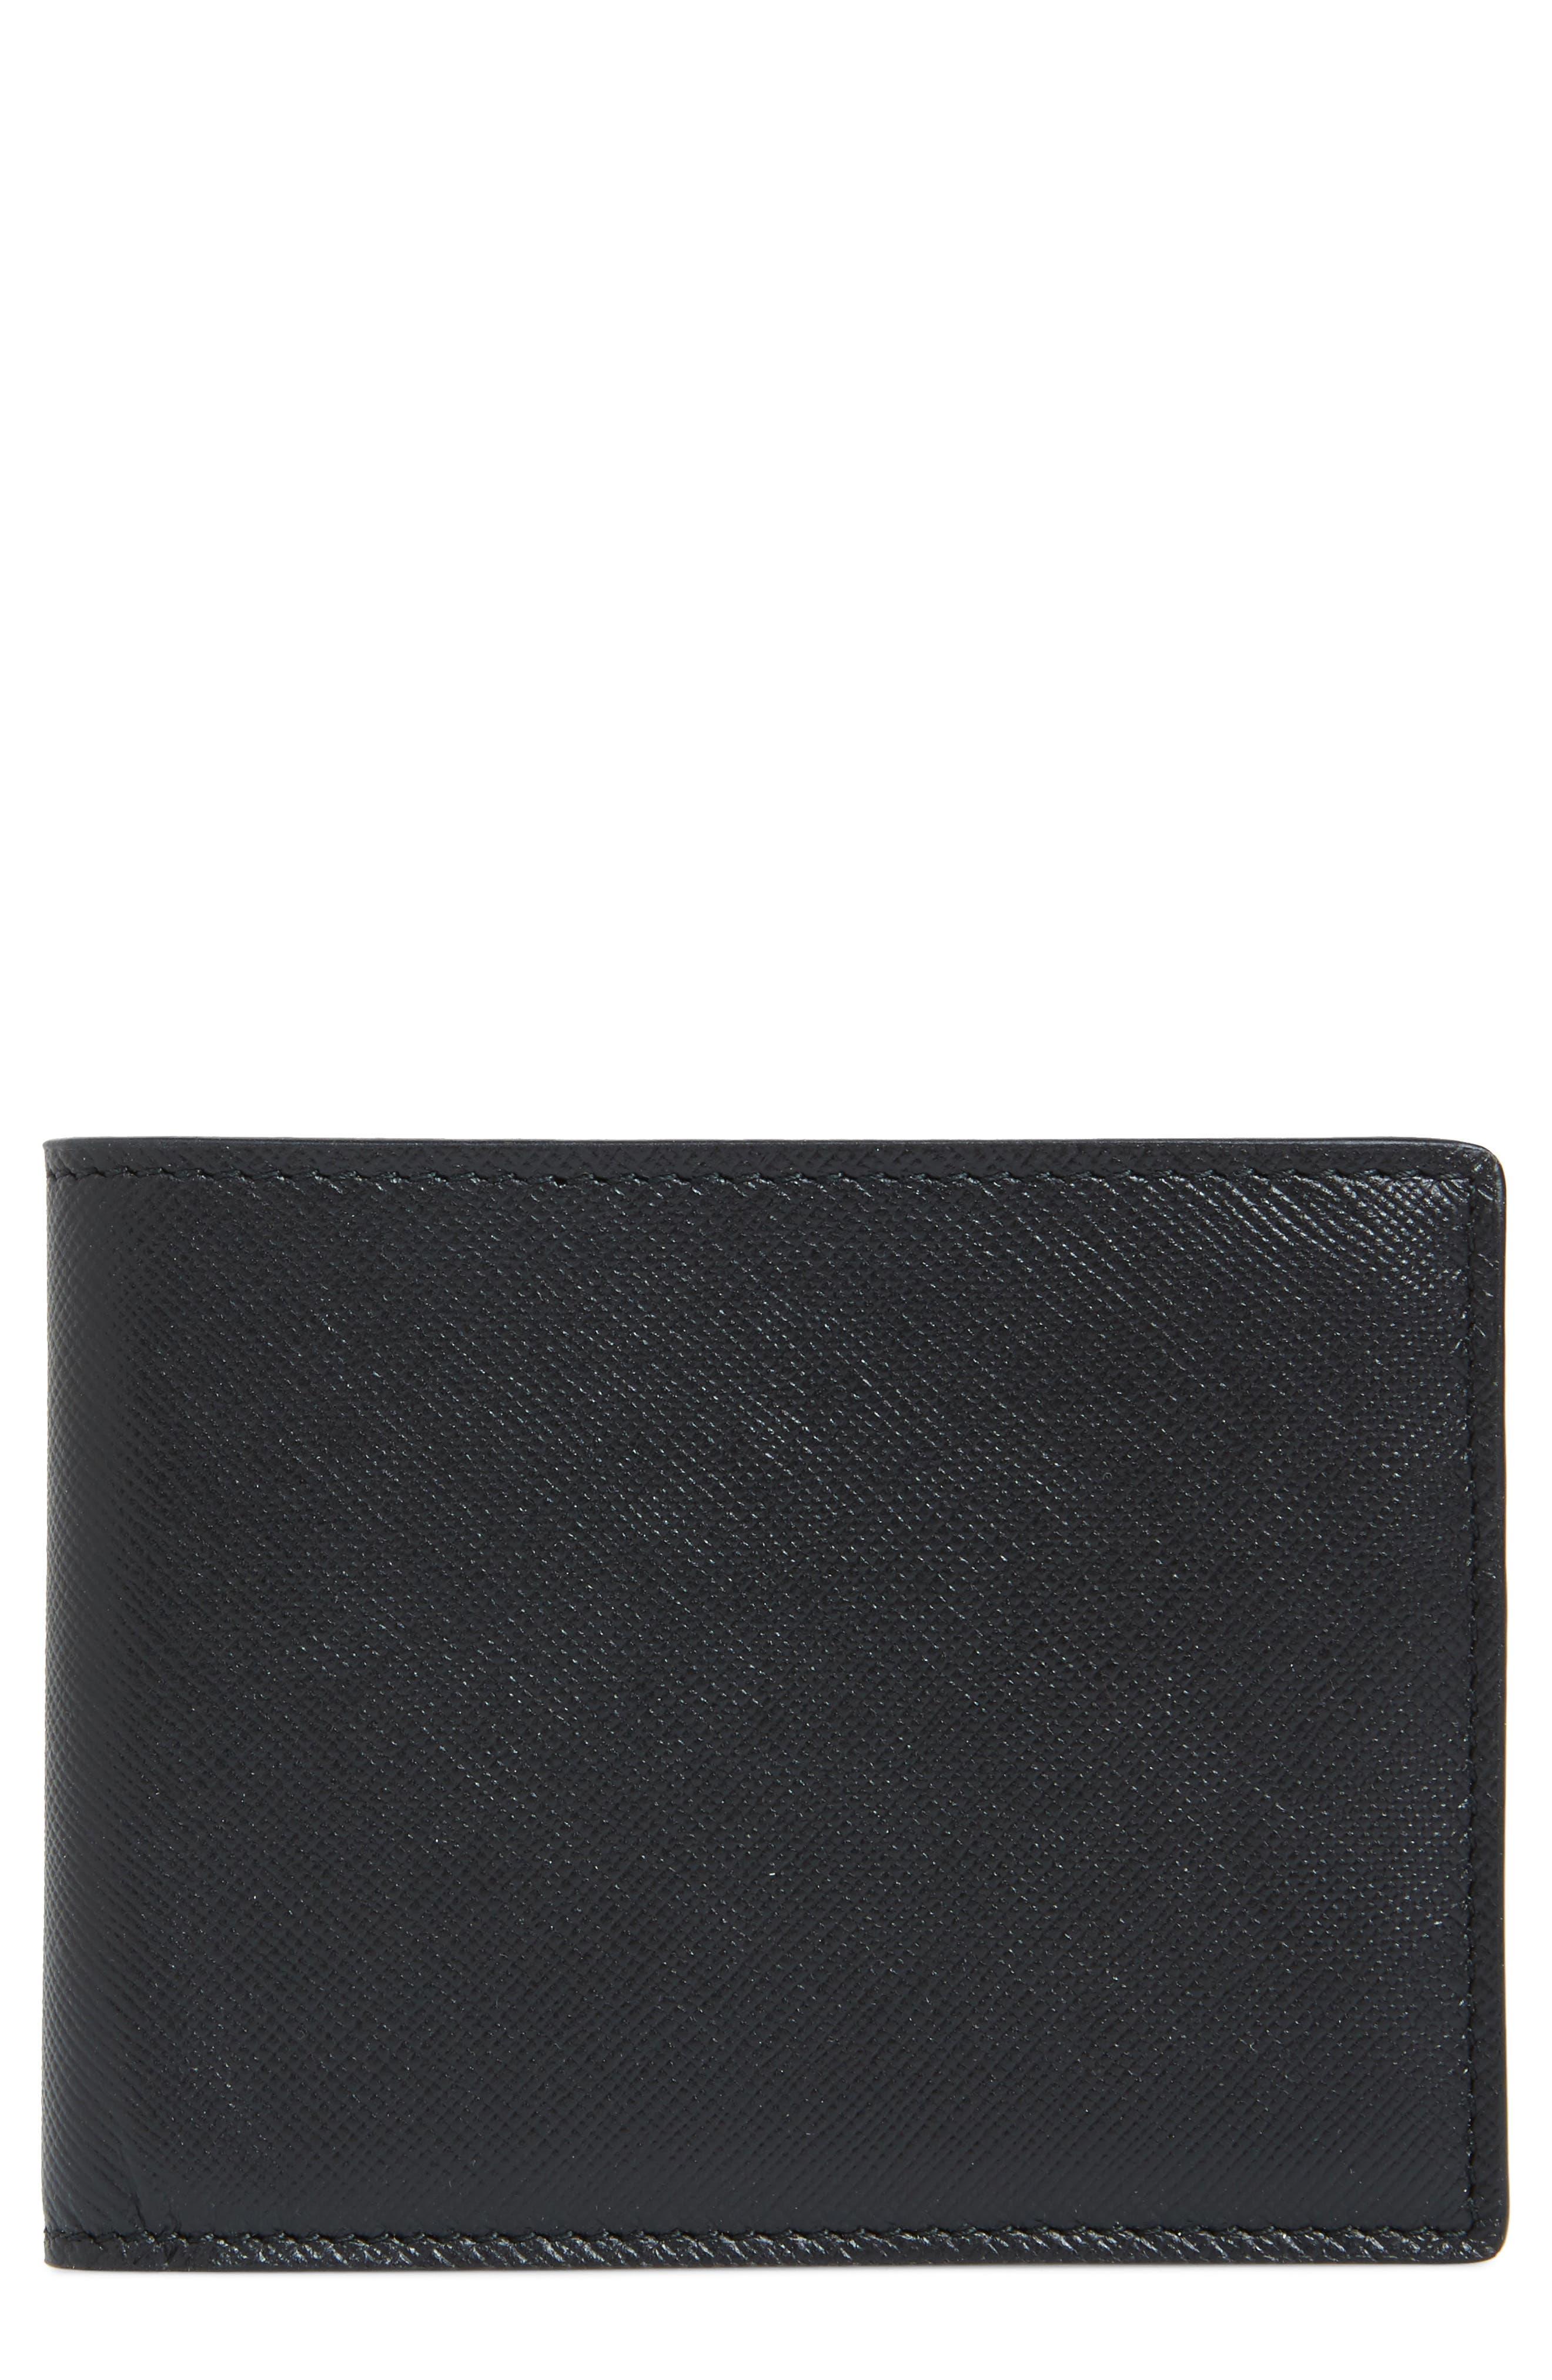 Saffiano Leather Wallet,                             Main thumbnail 1, color,                             BLACK